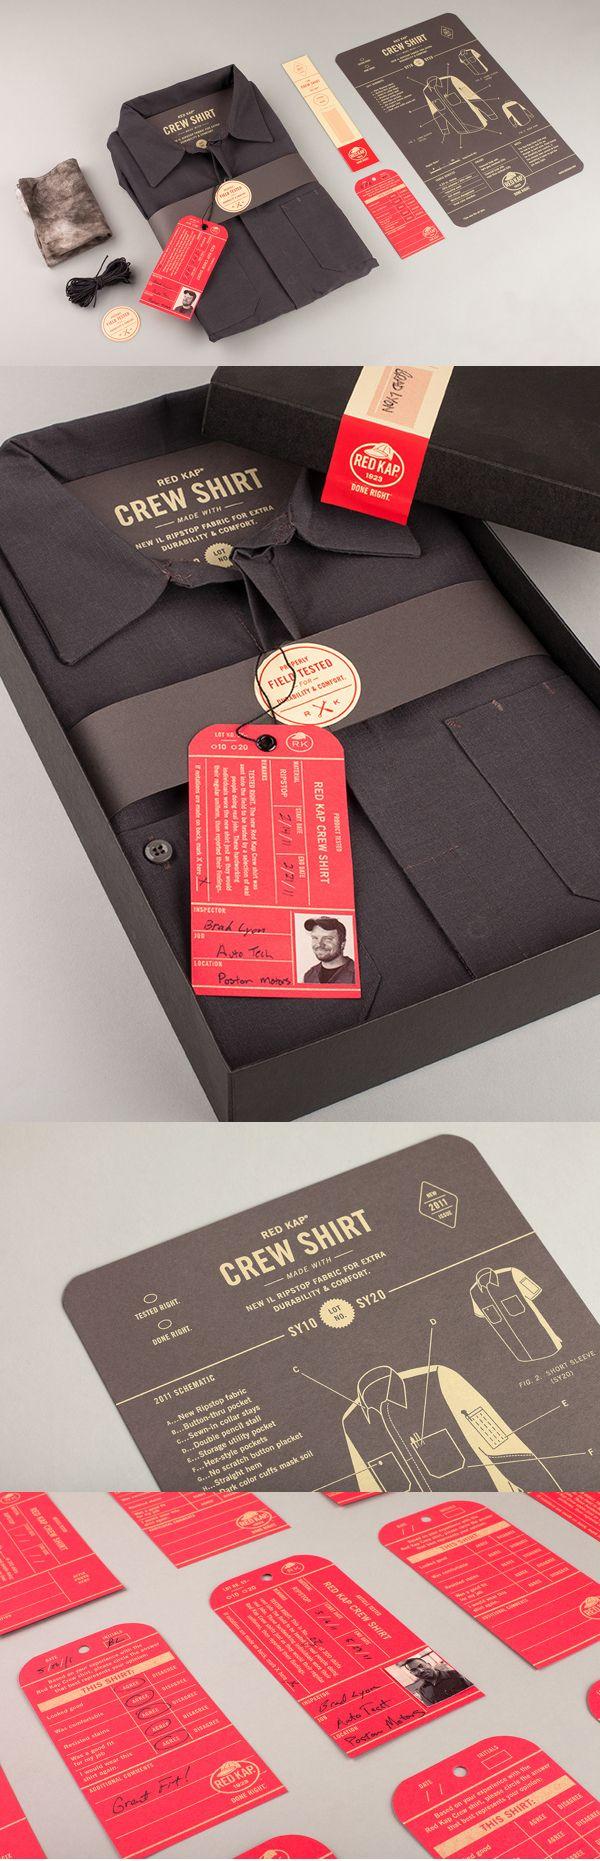 Here you go Léonie van D. a little longer pin. Red Kap #identity #packaging #branding PD